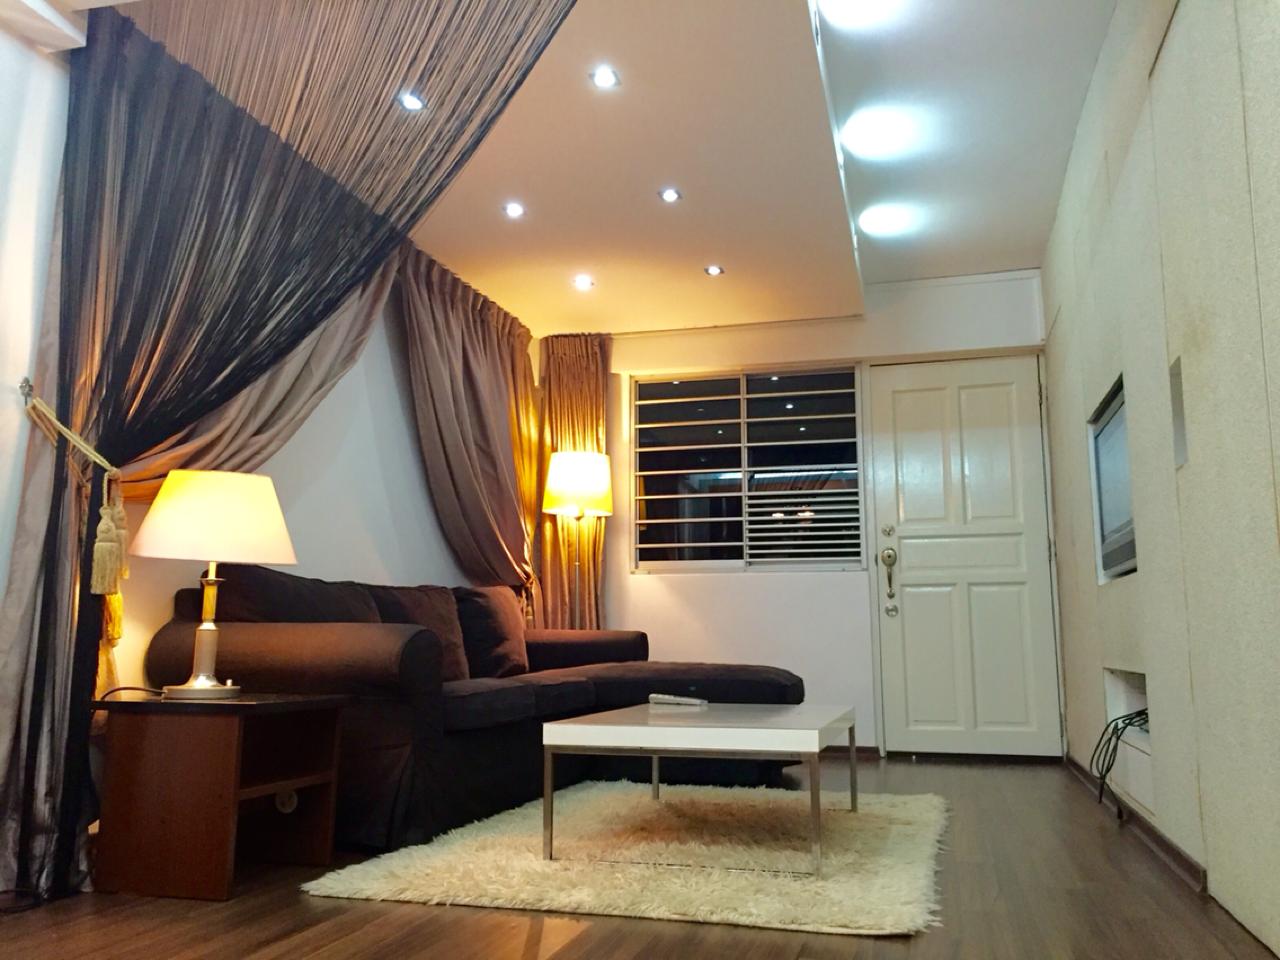 33 Telok Blangah Way 33 Telok Blangah Way 2 Bedrooms 635 Sqft Hdb Flats For Rent By Hong Li